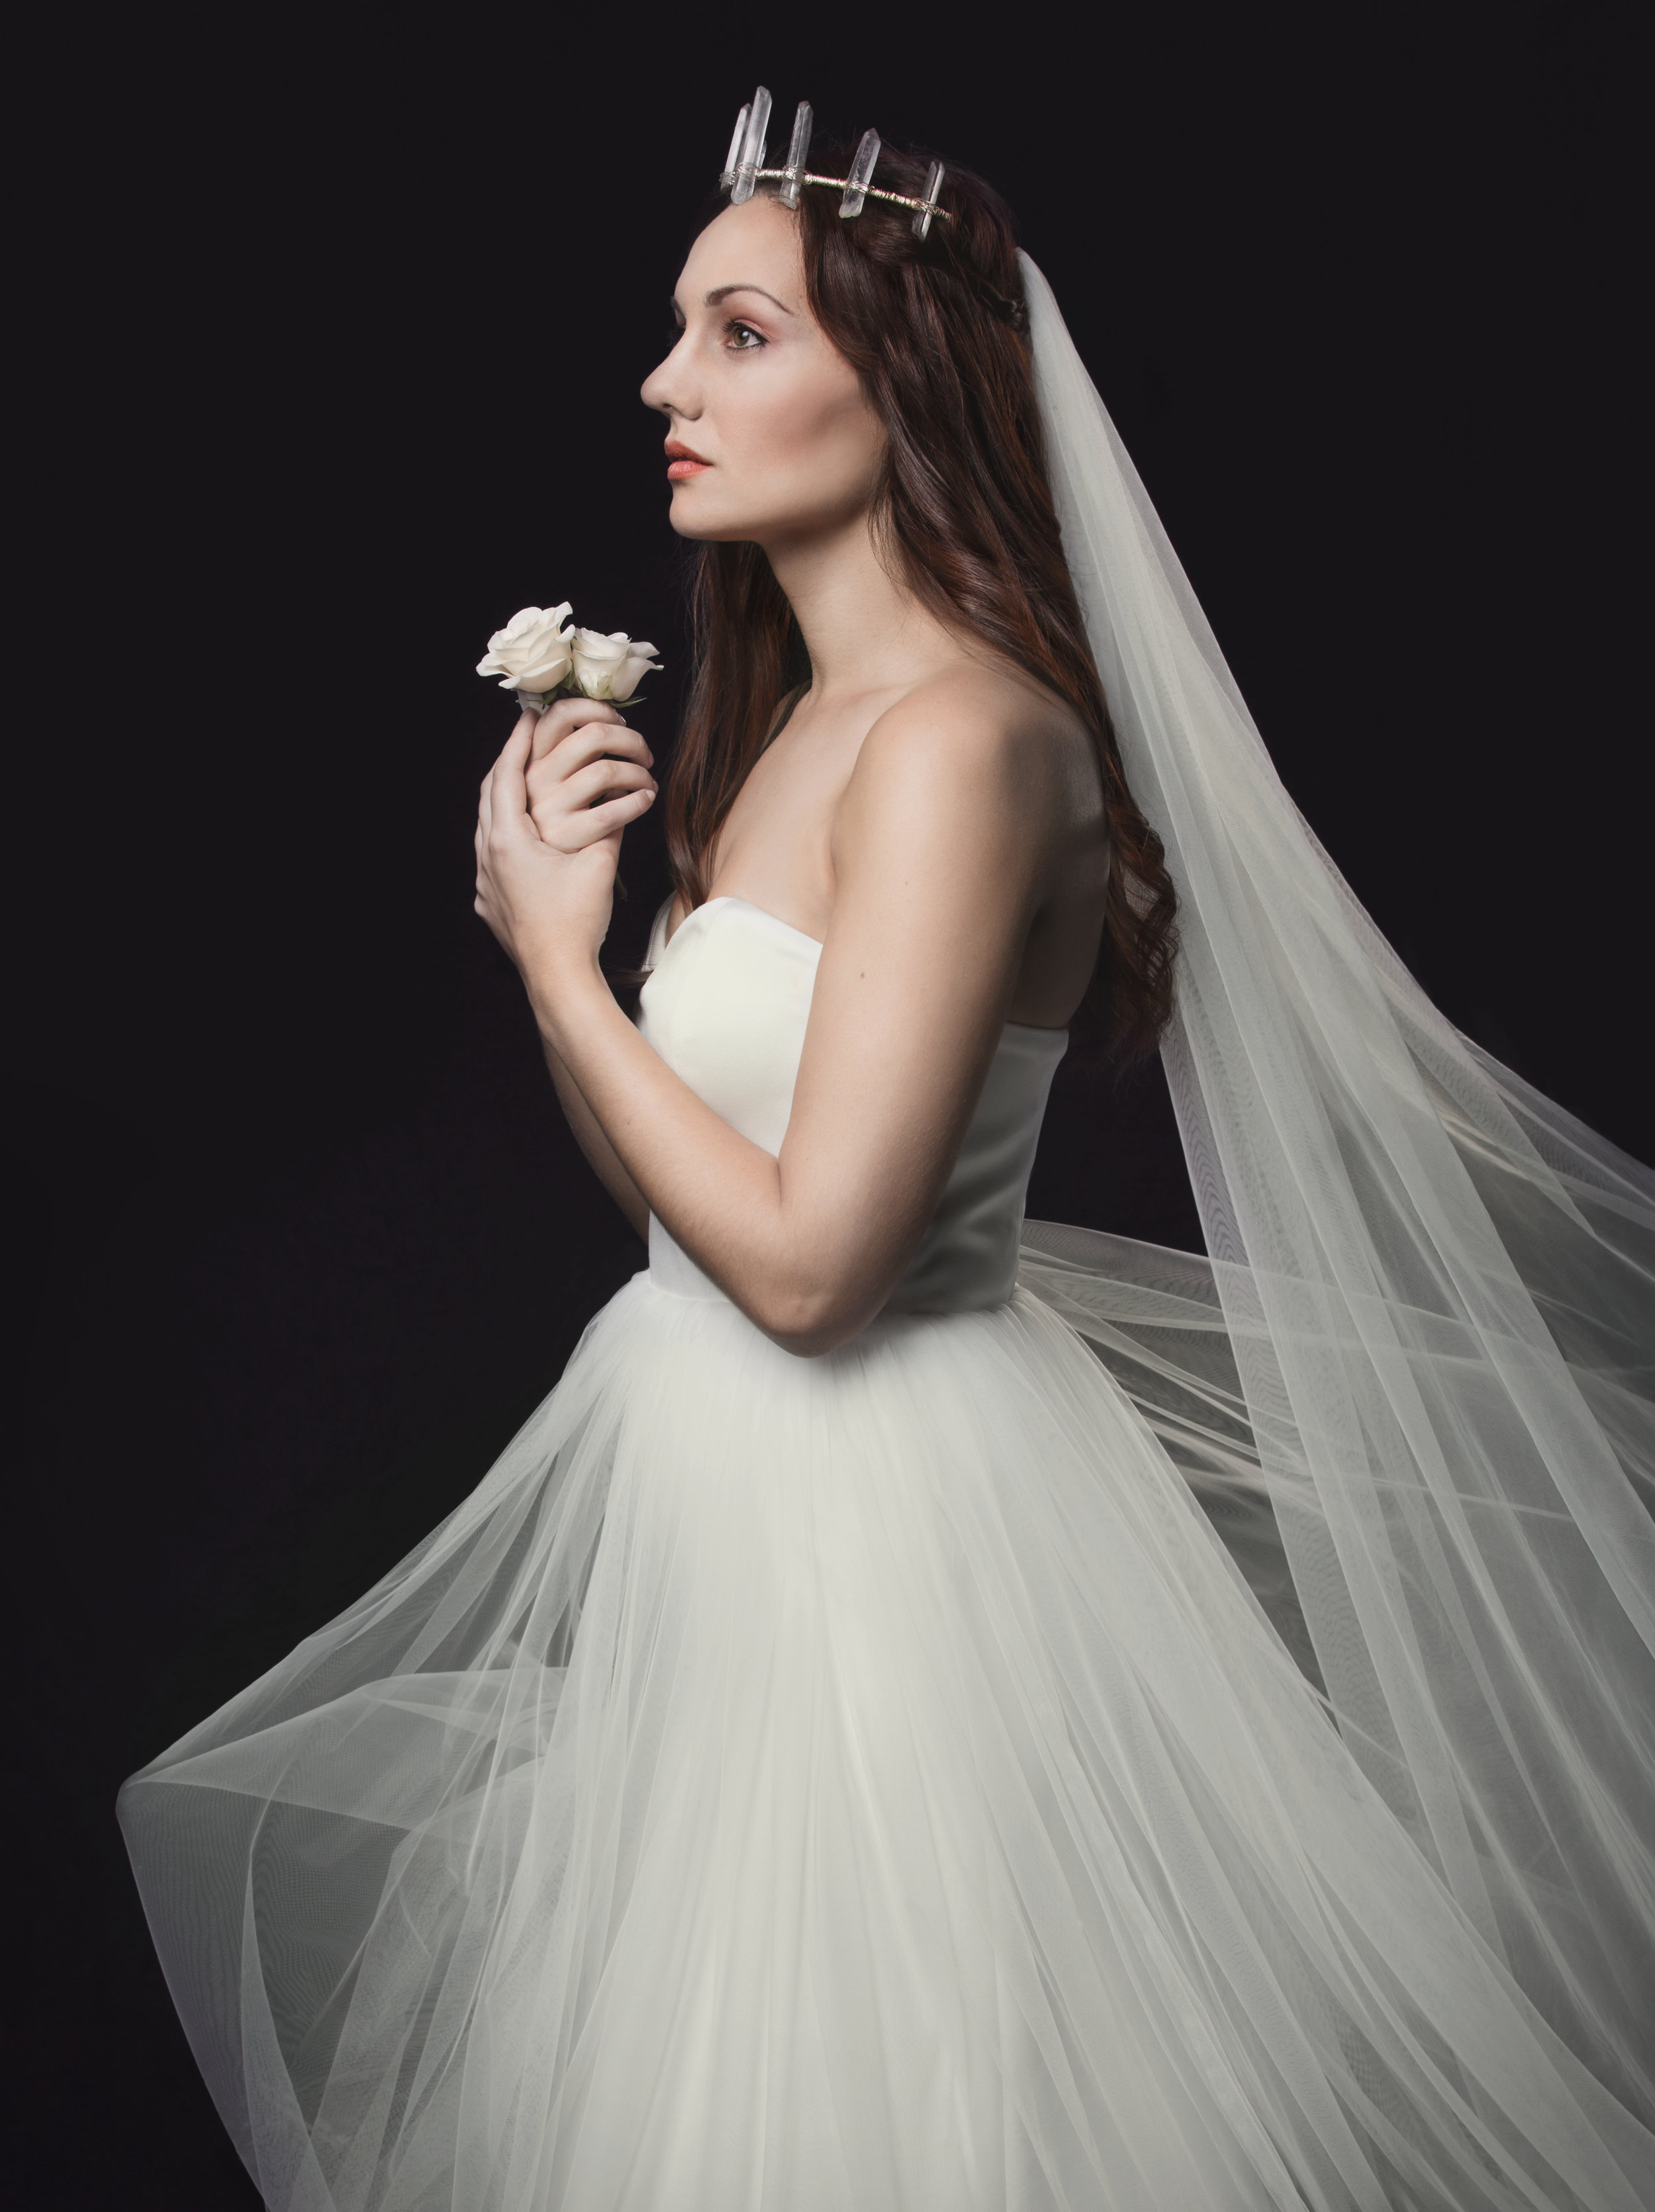 Fieulaine-Fine-Art-Bridal_Farryn-01-2.jpg